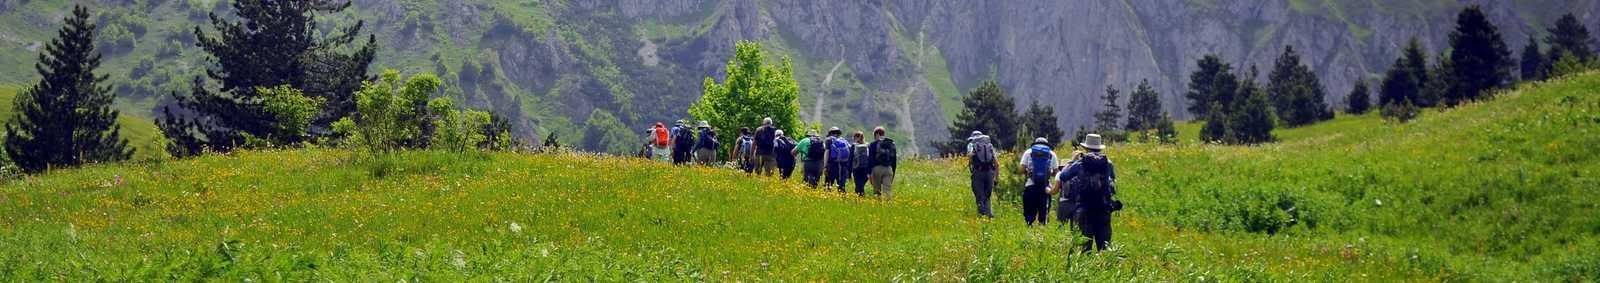 Walking in Bosnia and Herzegovina